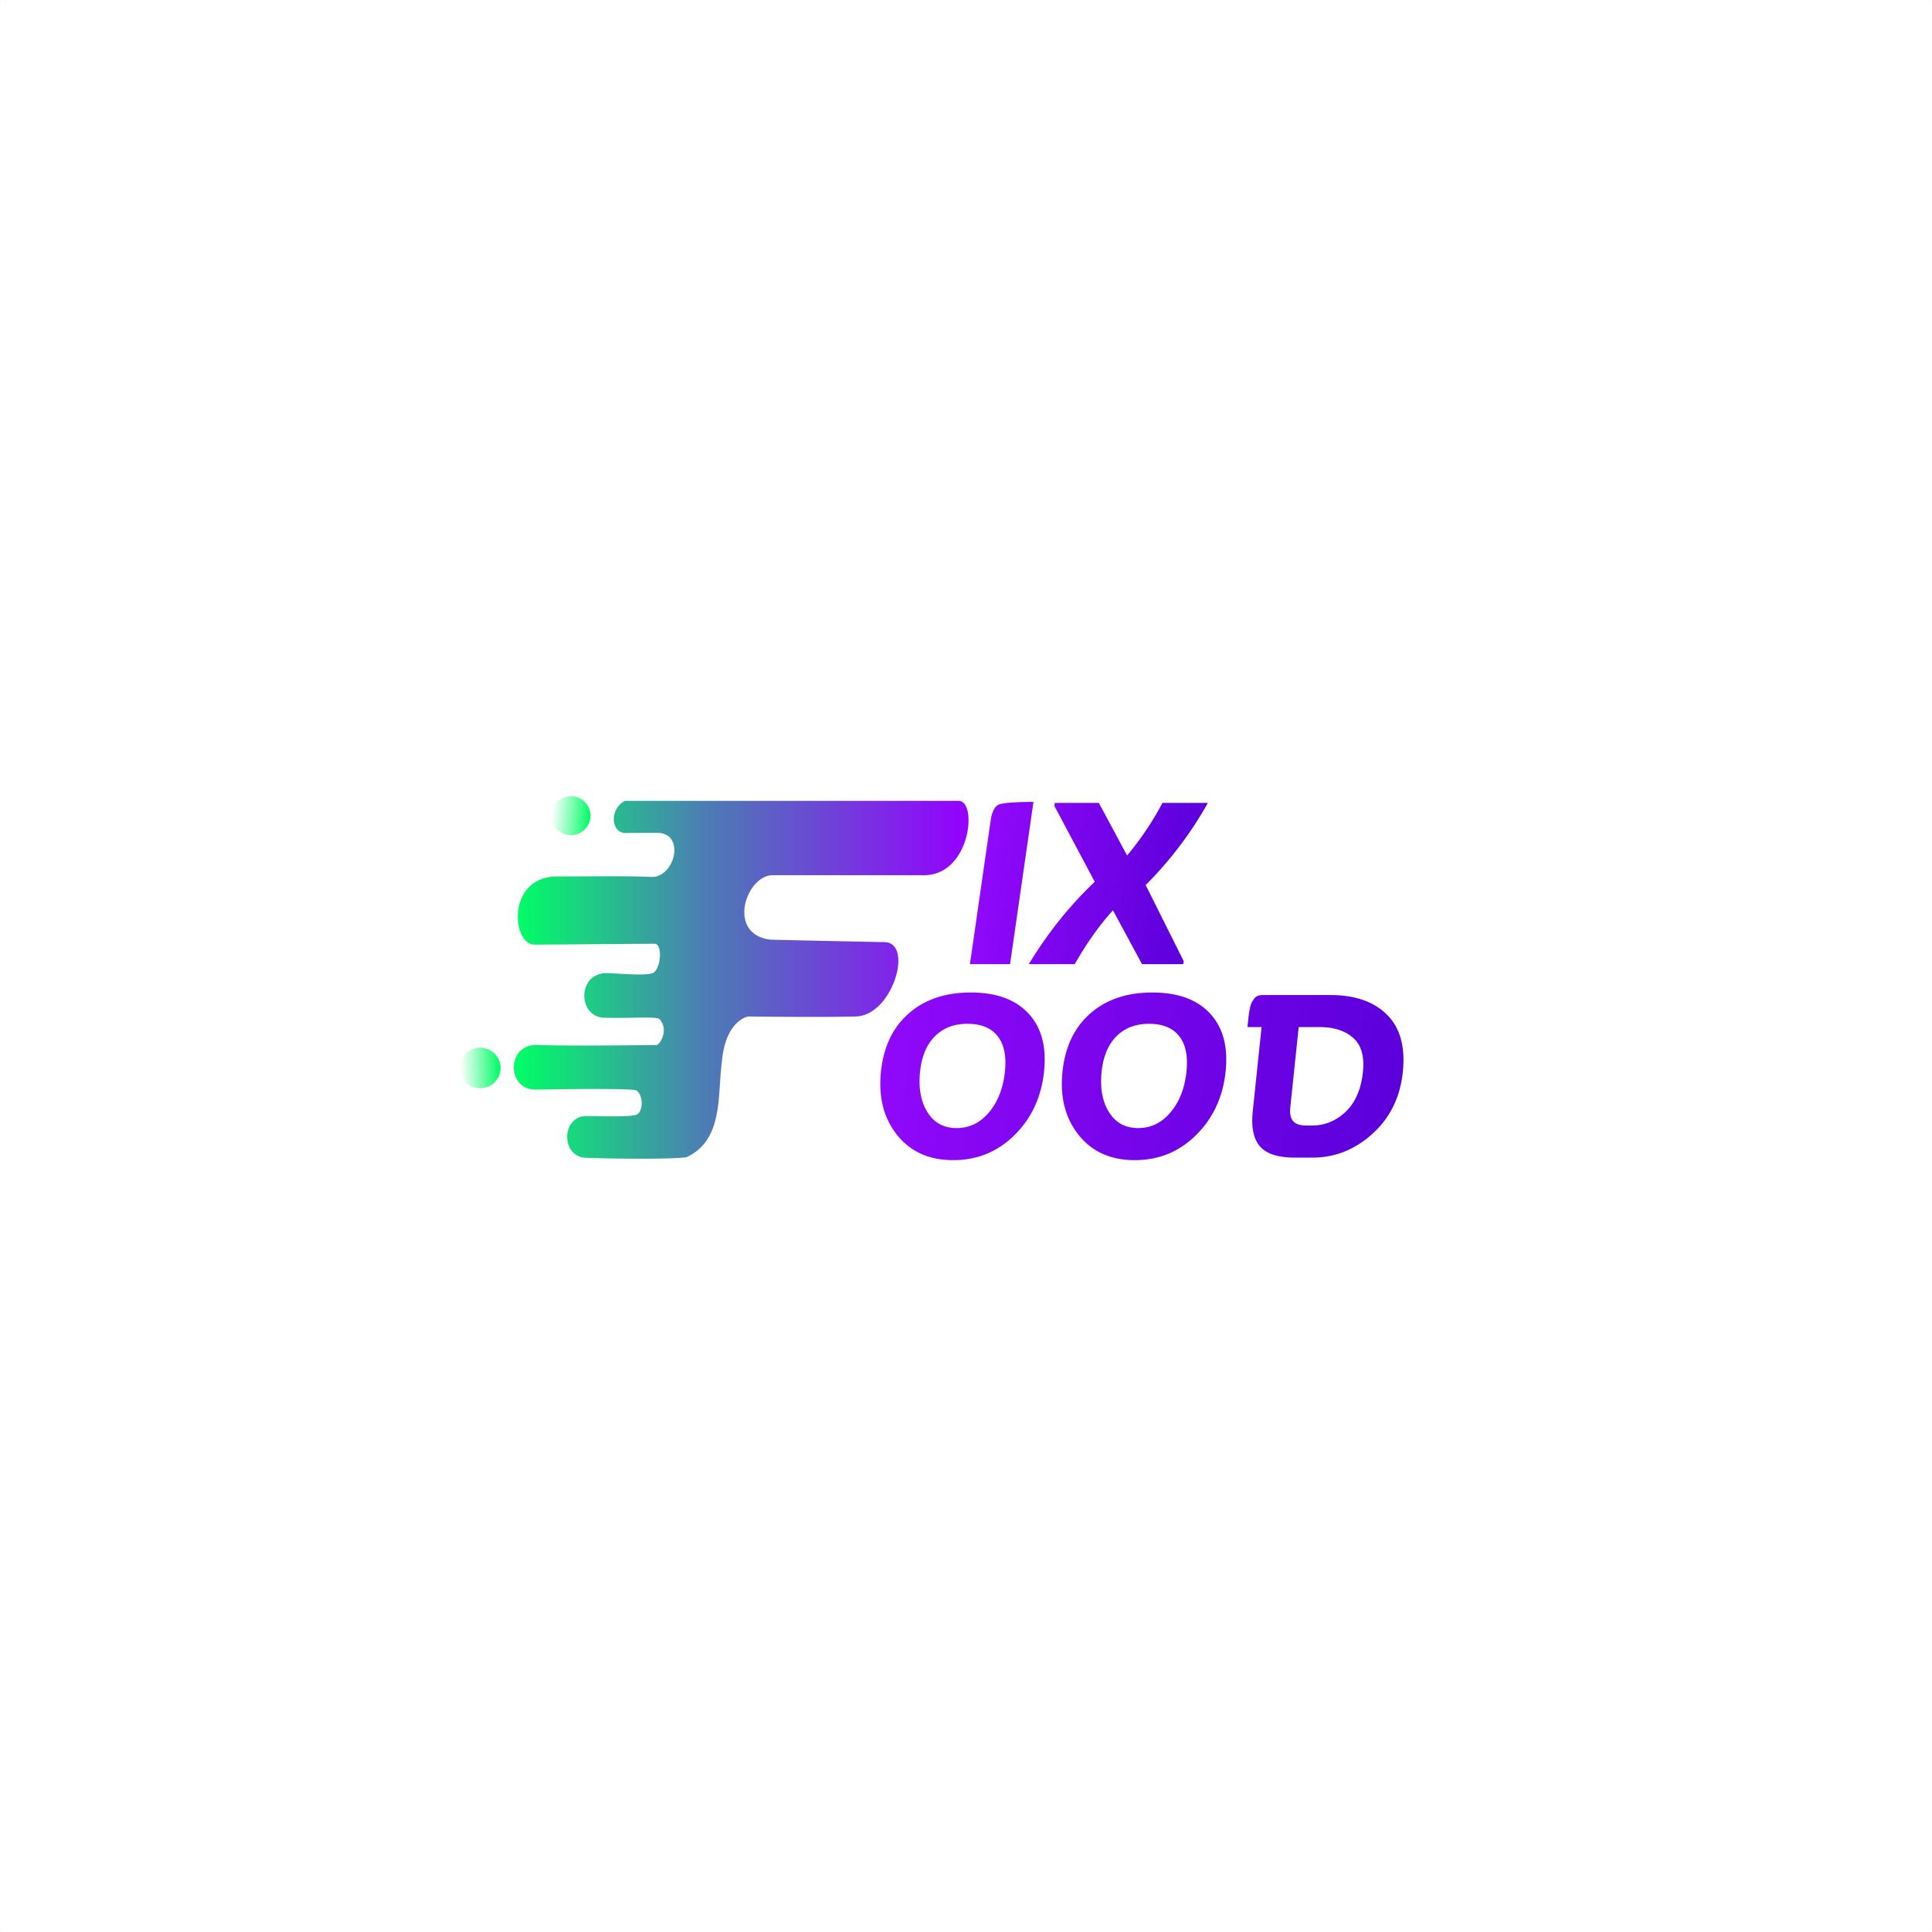 Логотип для доставки еды фото f_6675ec9a3d333521.png